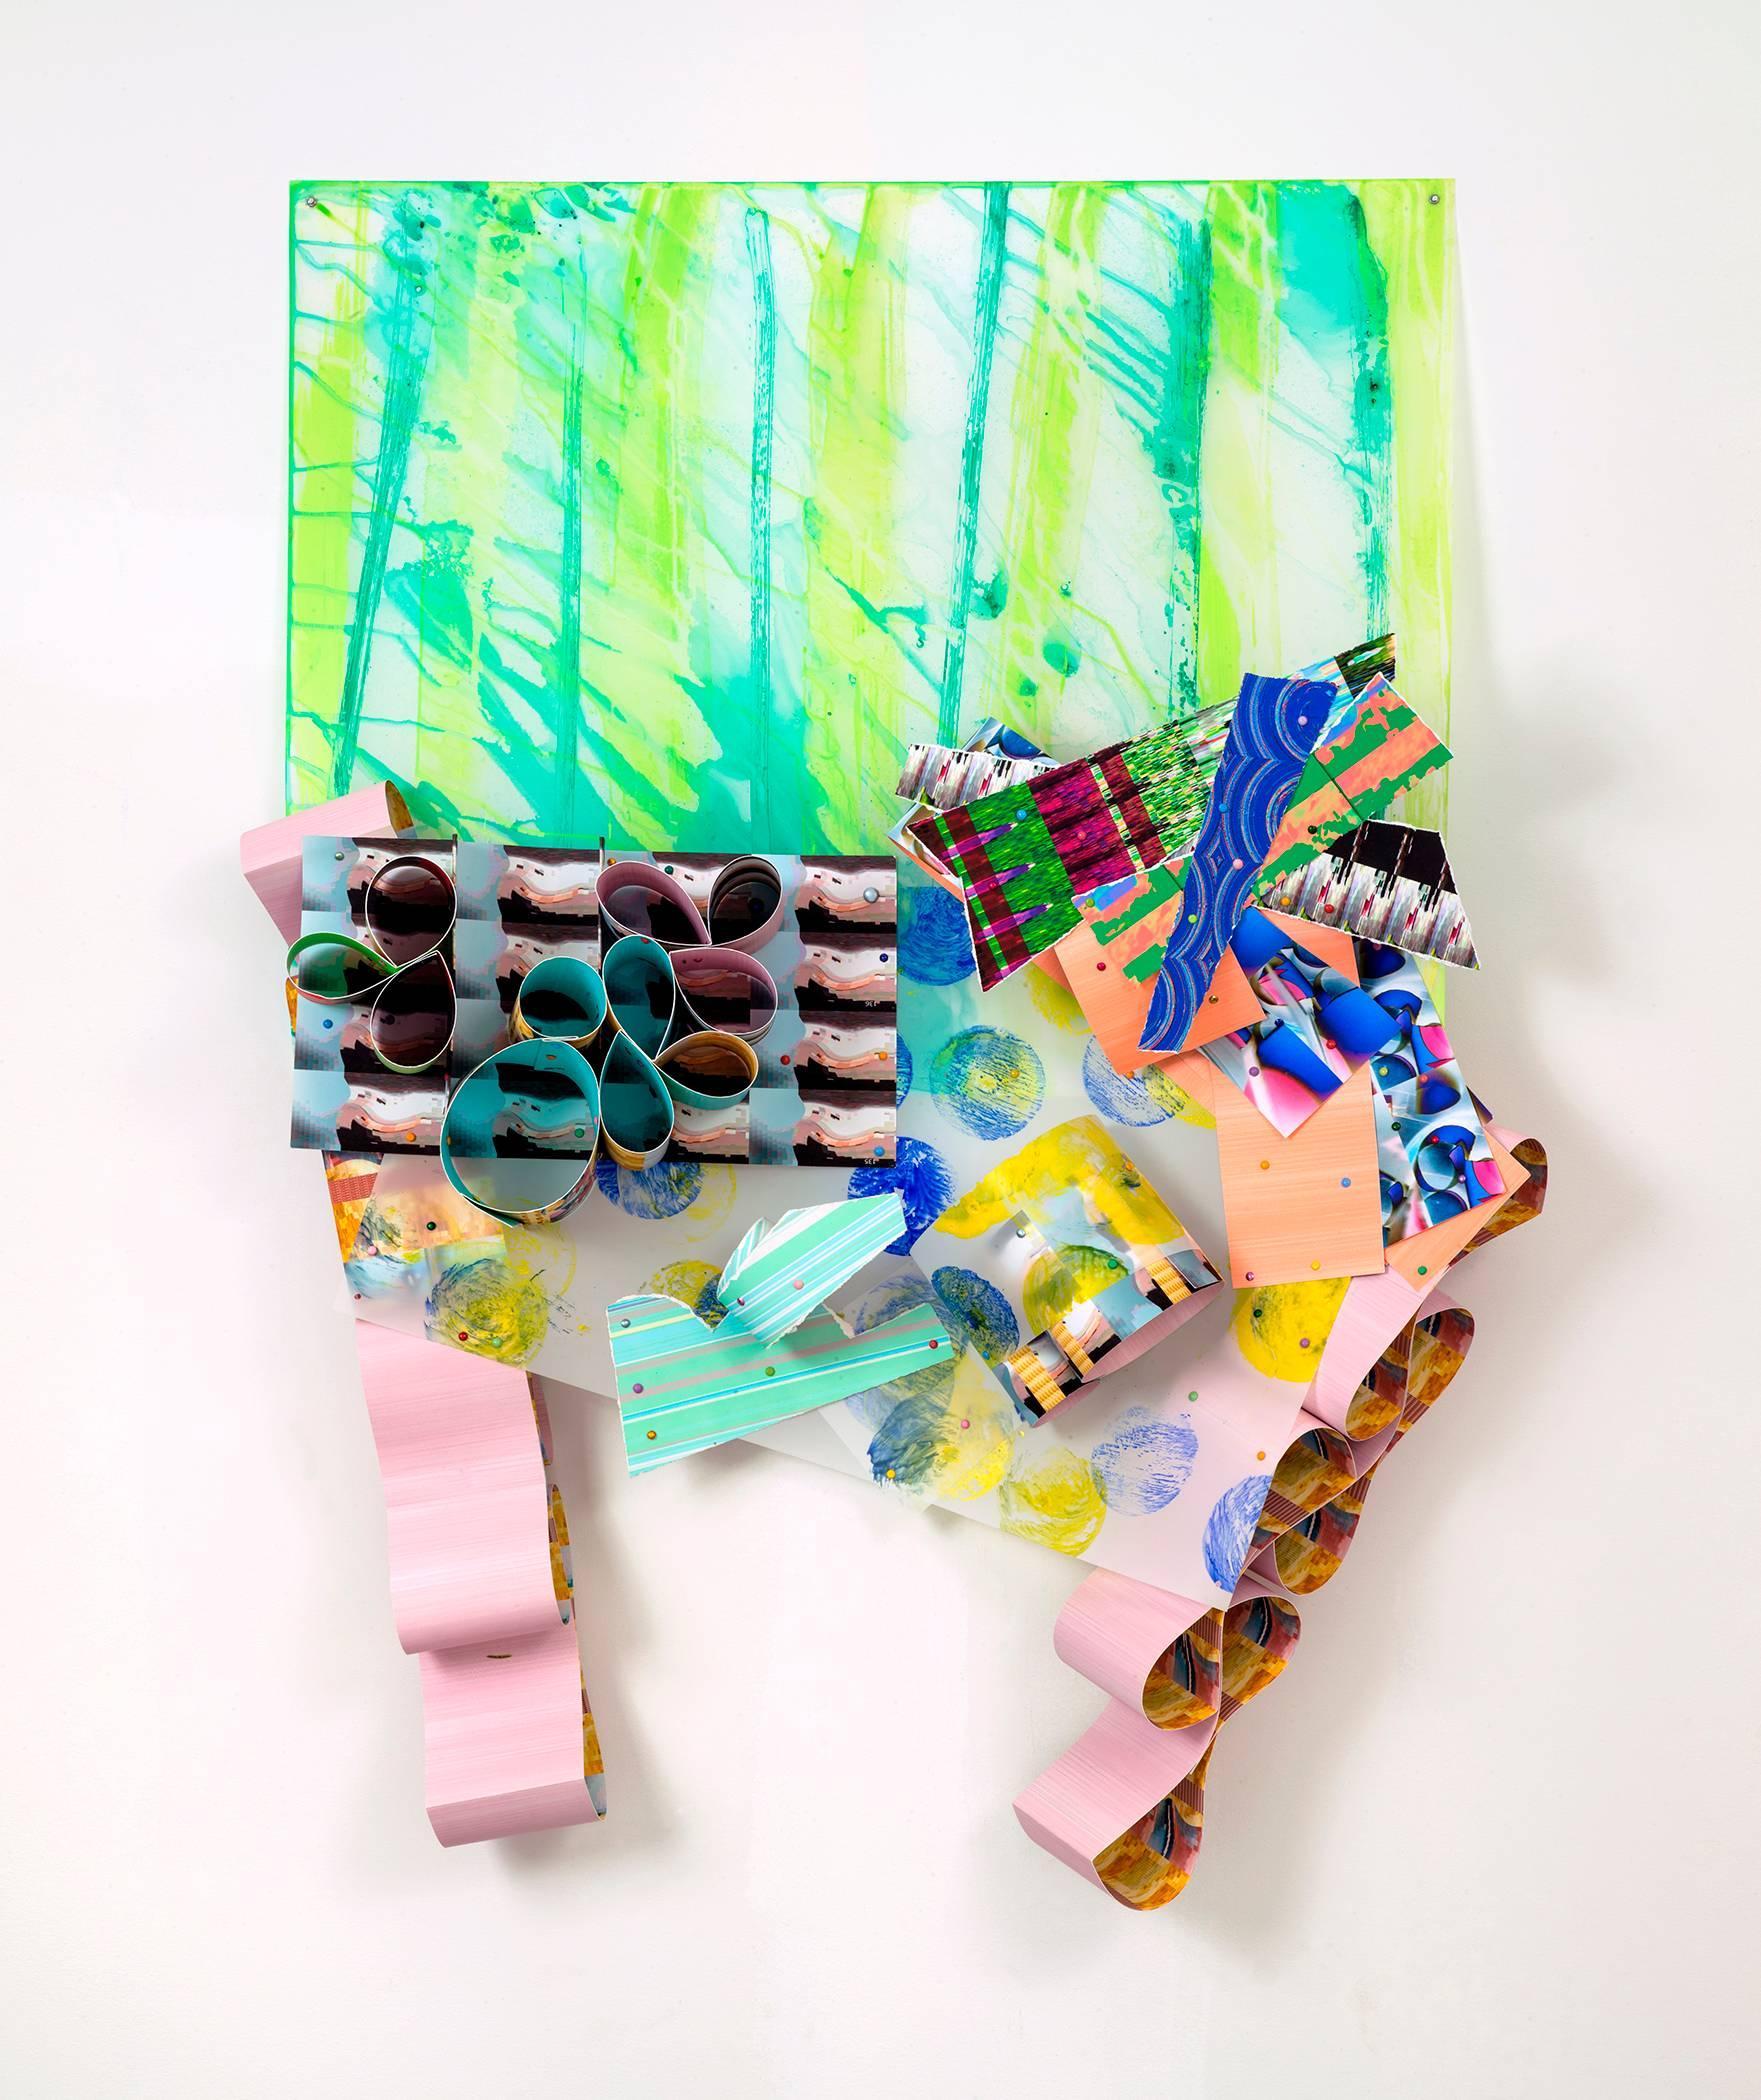 Elizabeth Riley, Video Feet, 2017, Paper, Acrylic Paint, Inkjet Print, Polyester